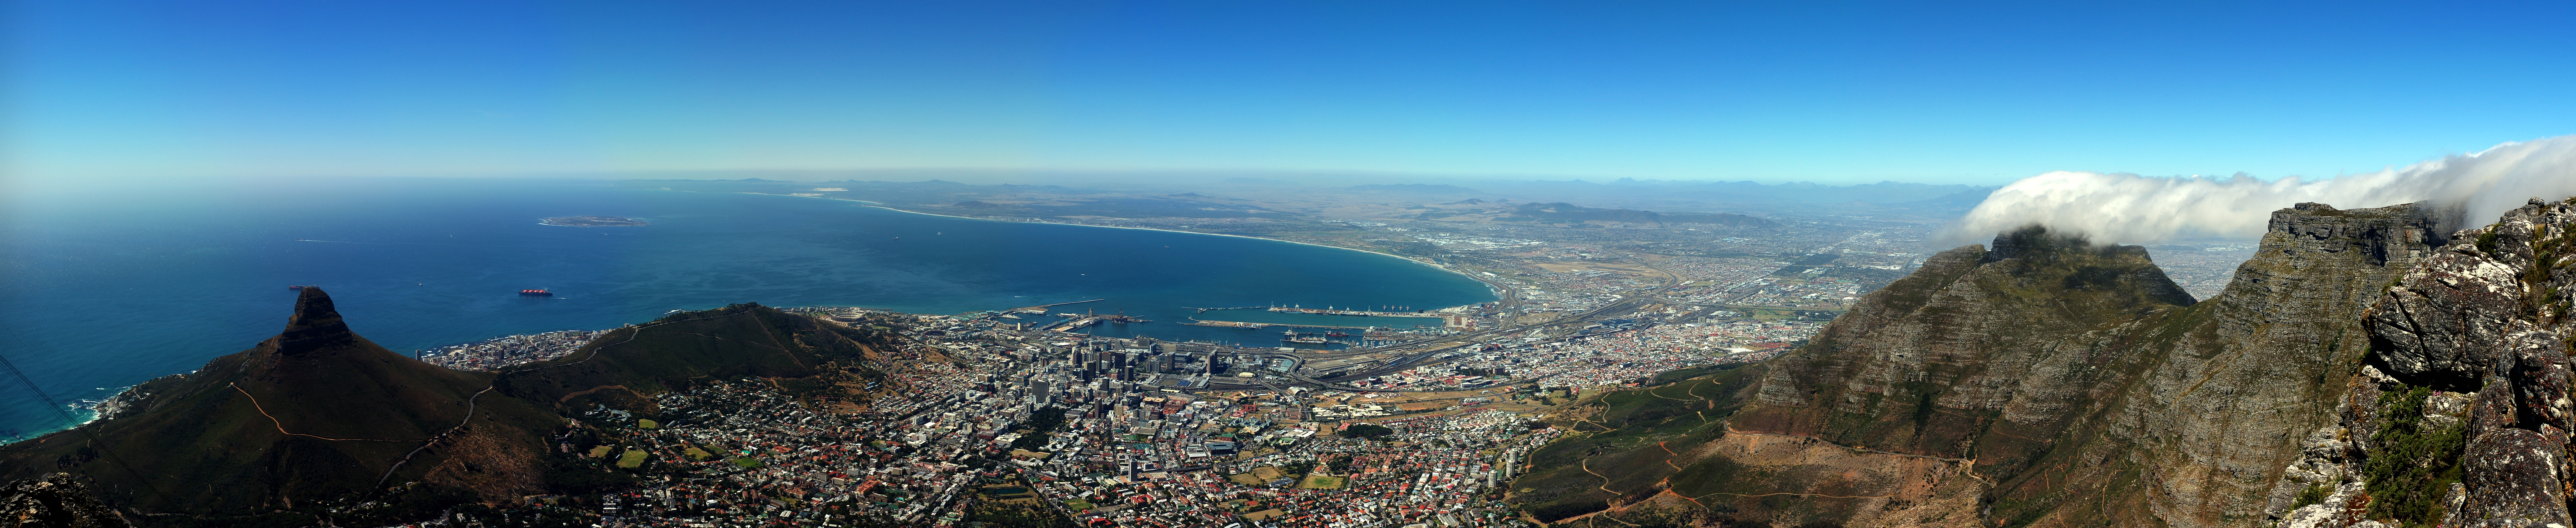 File Capetownpanoramafromtablemountain Jpg Wikimedia Commons